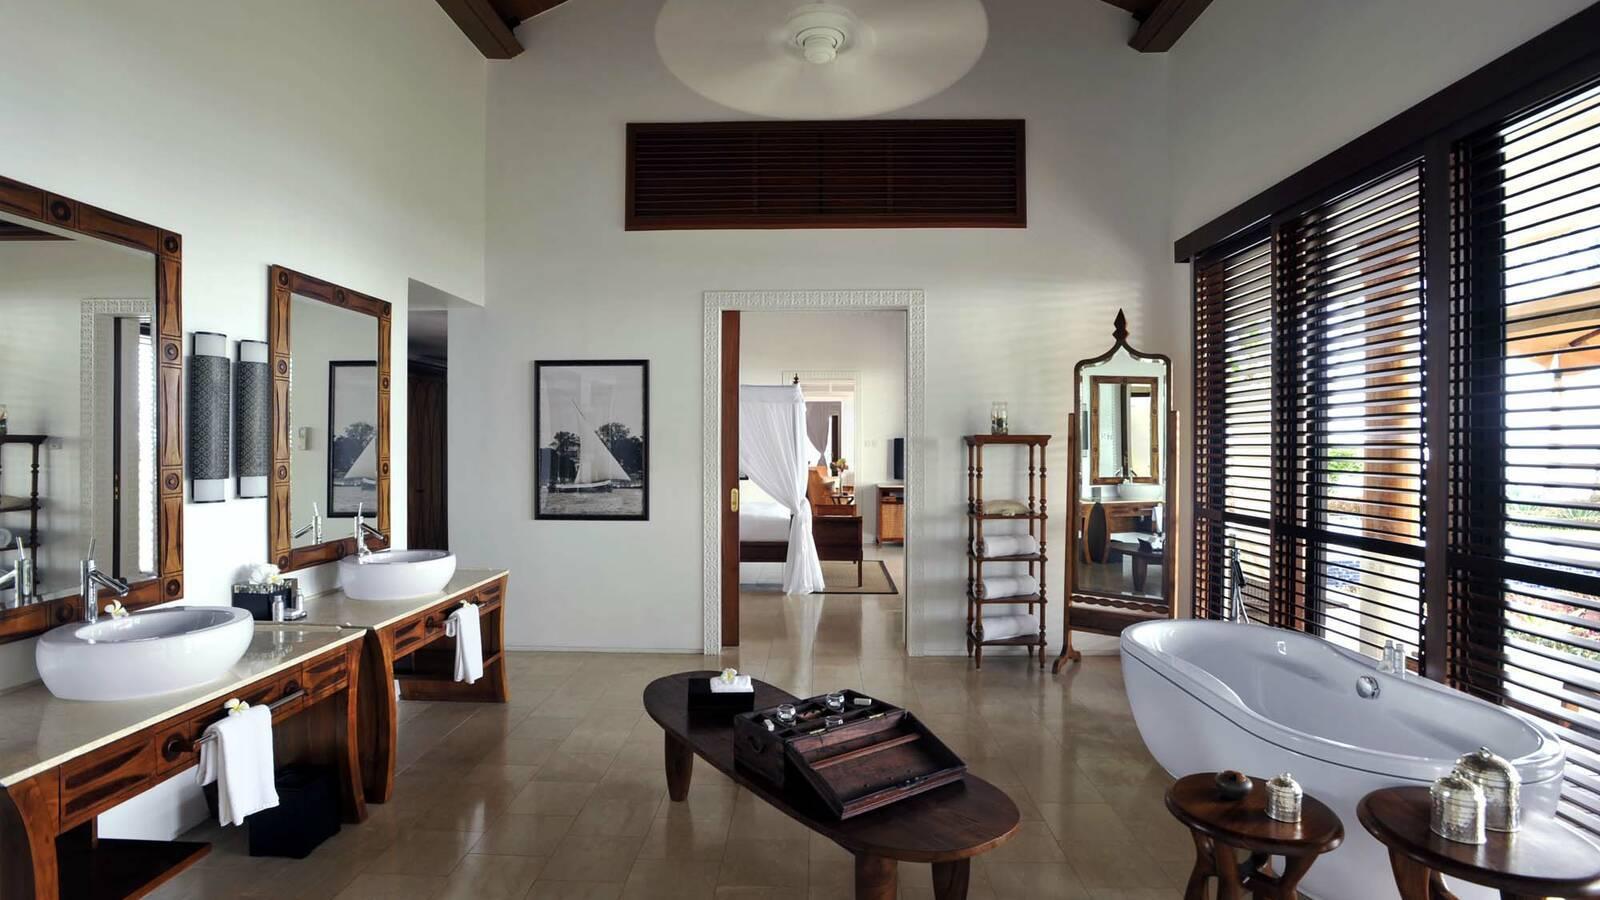 The Residence Suite Presidentielle Salle De Bain Zanzibar